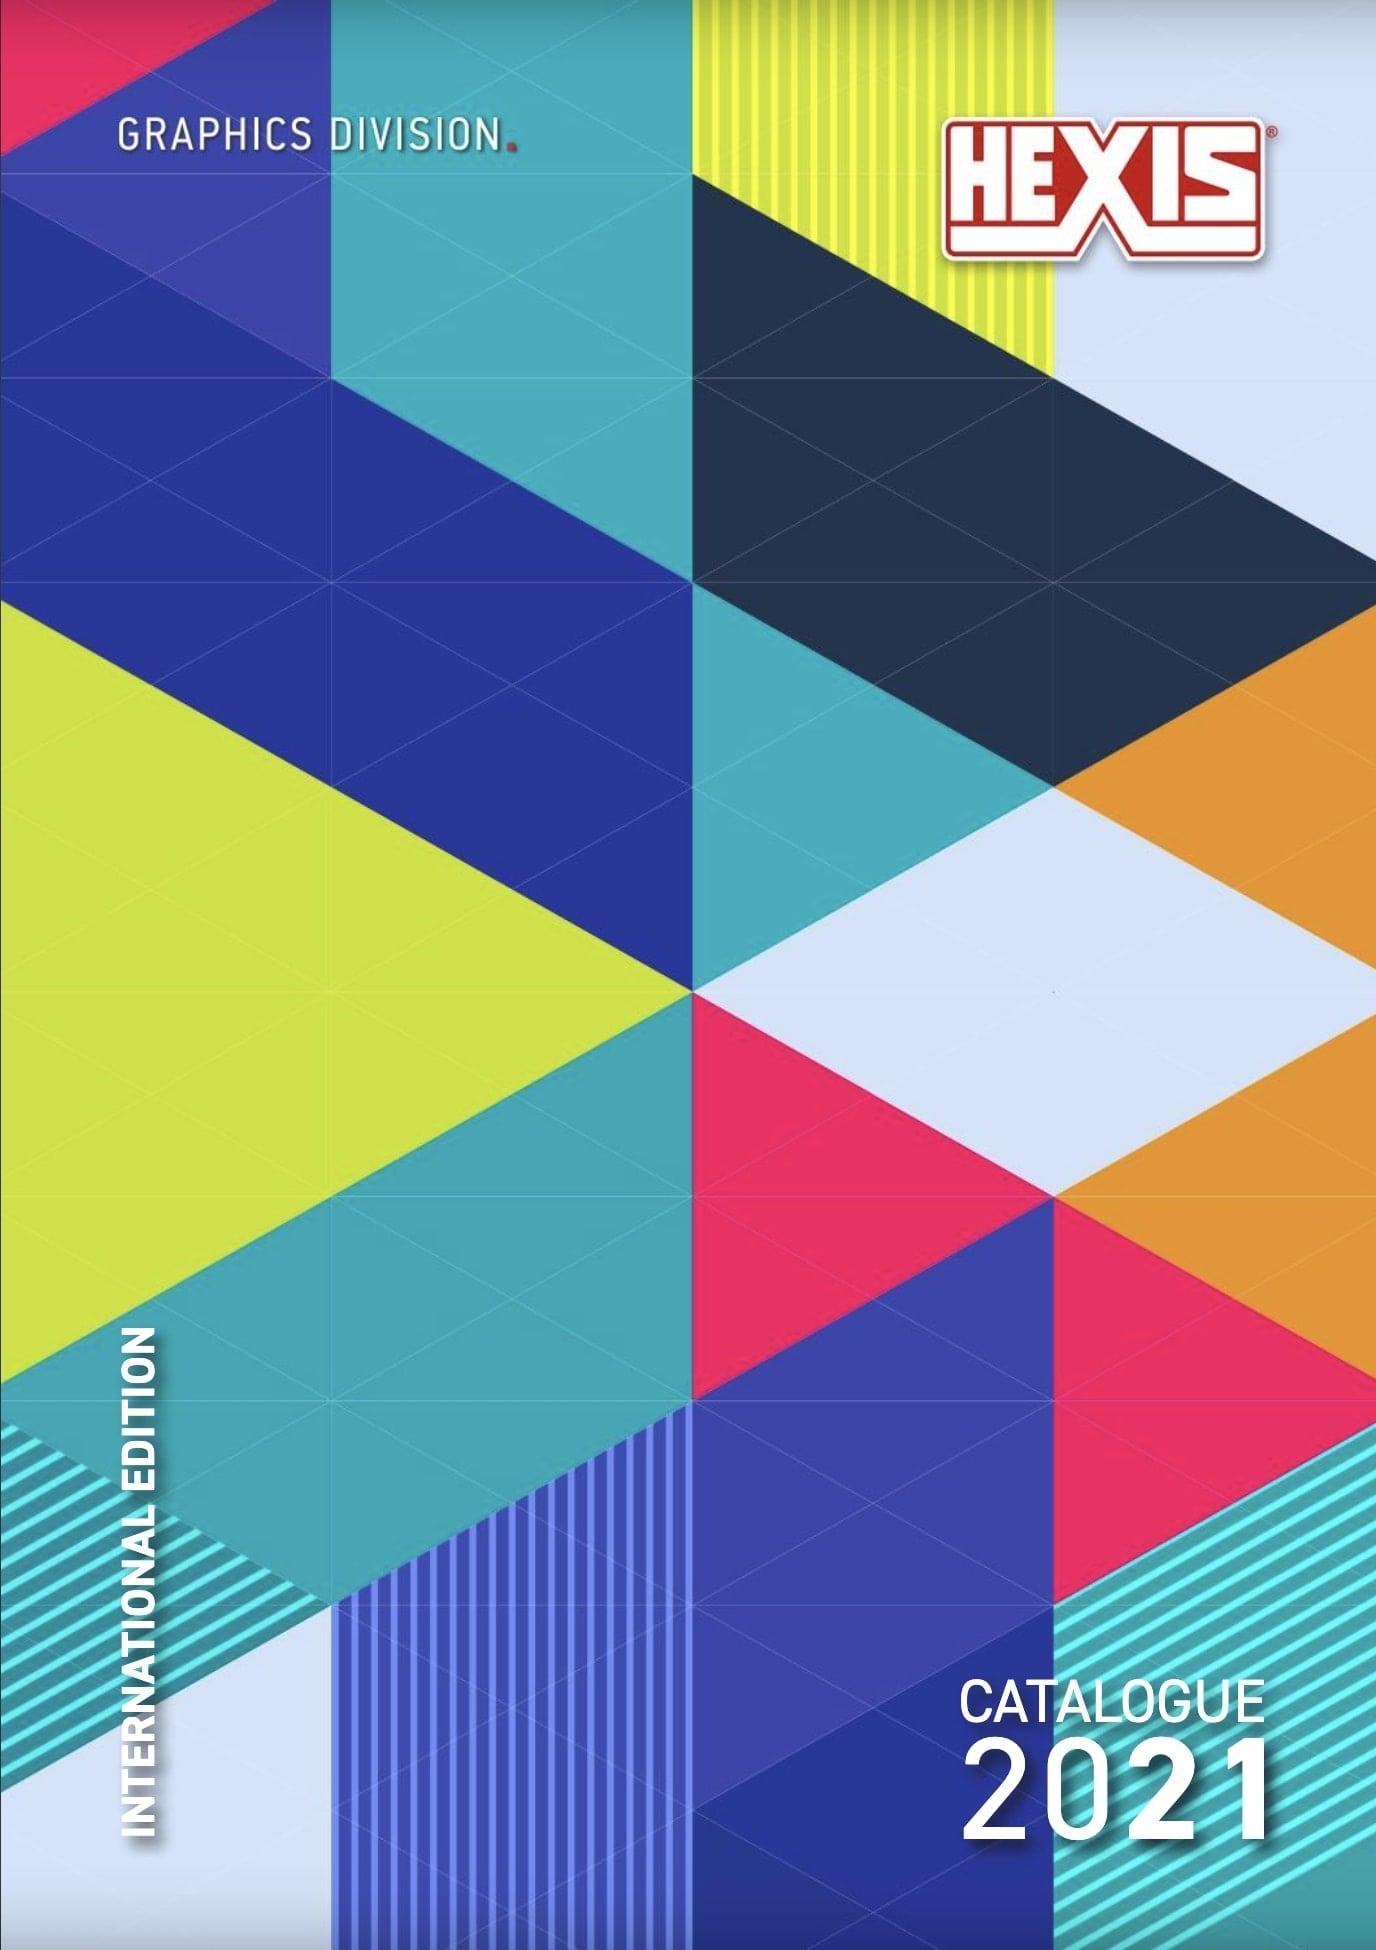 hexis-international-catalogue-2021 (1)